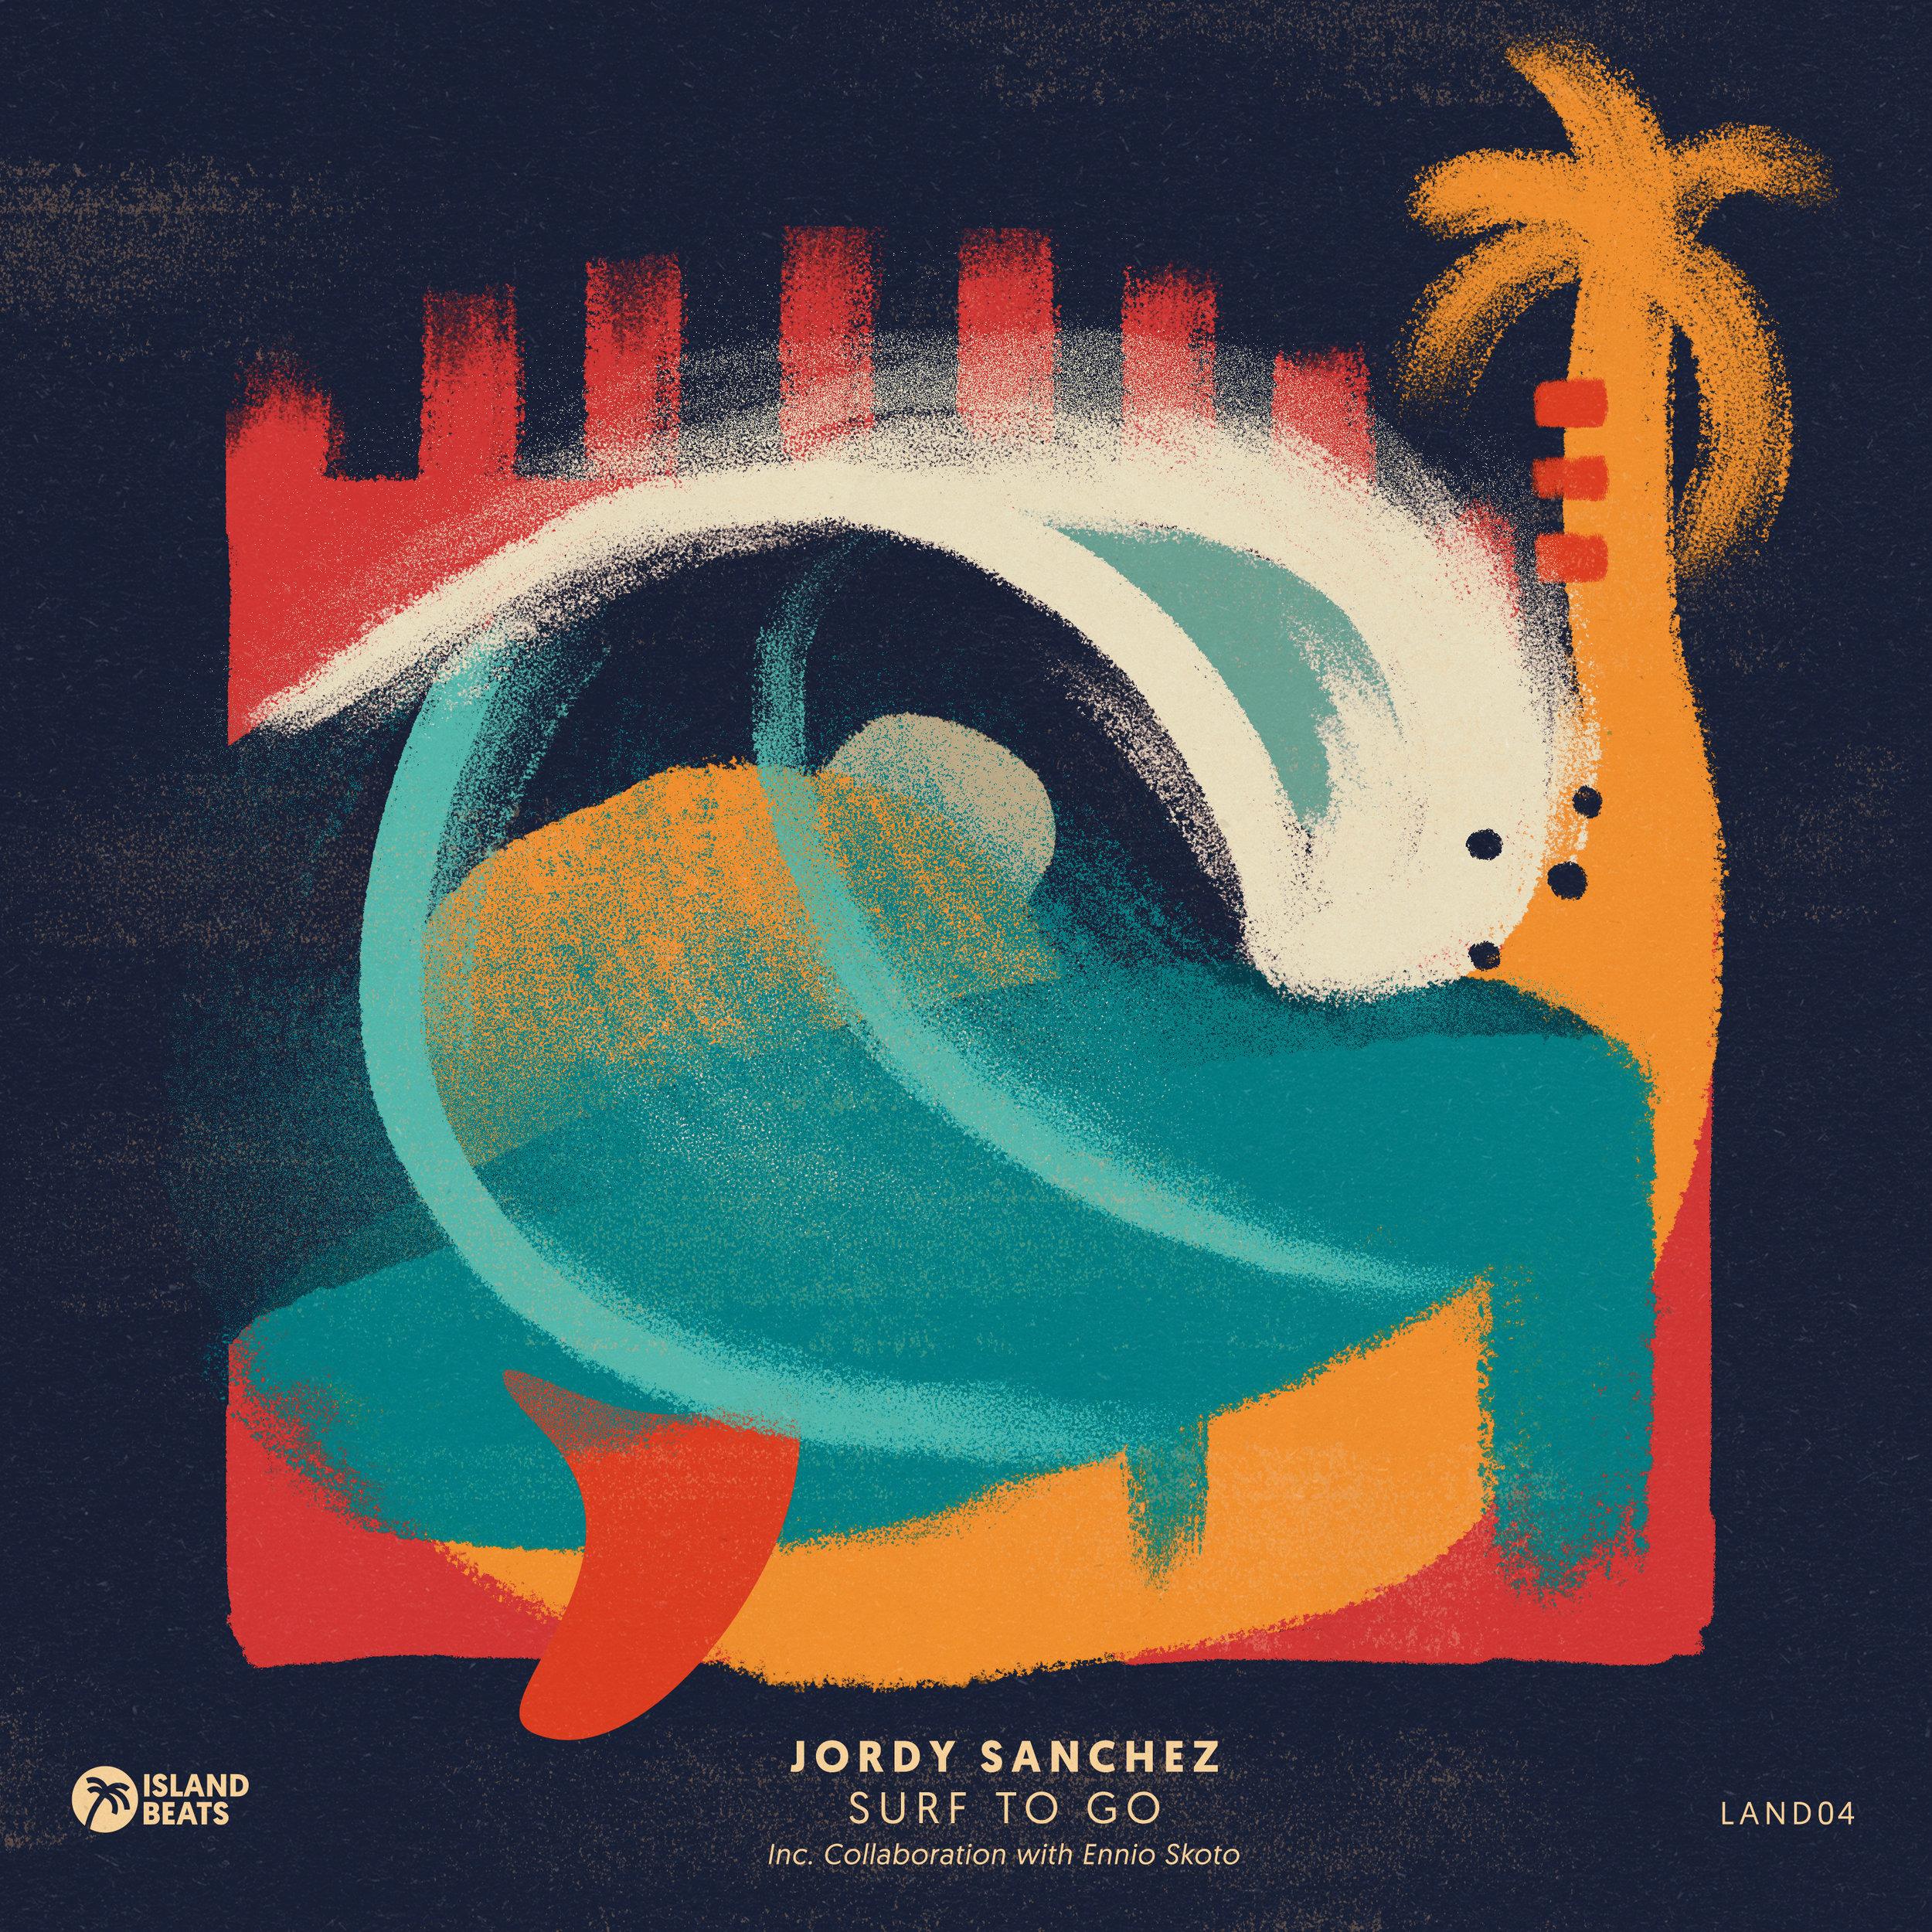 Jordy Sánchez - Surf To Go - Inc. Collaboration with Ennio Skoto